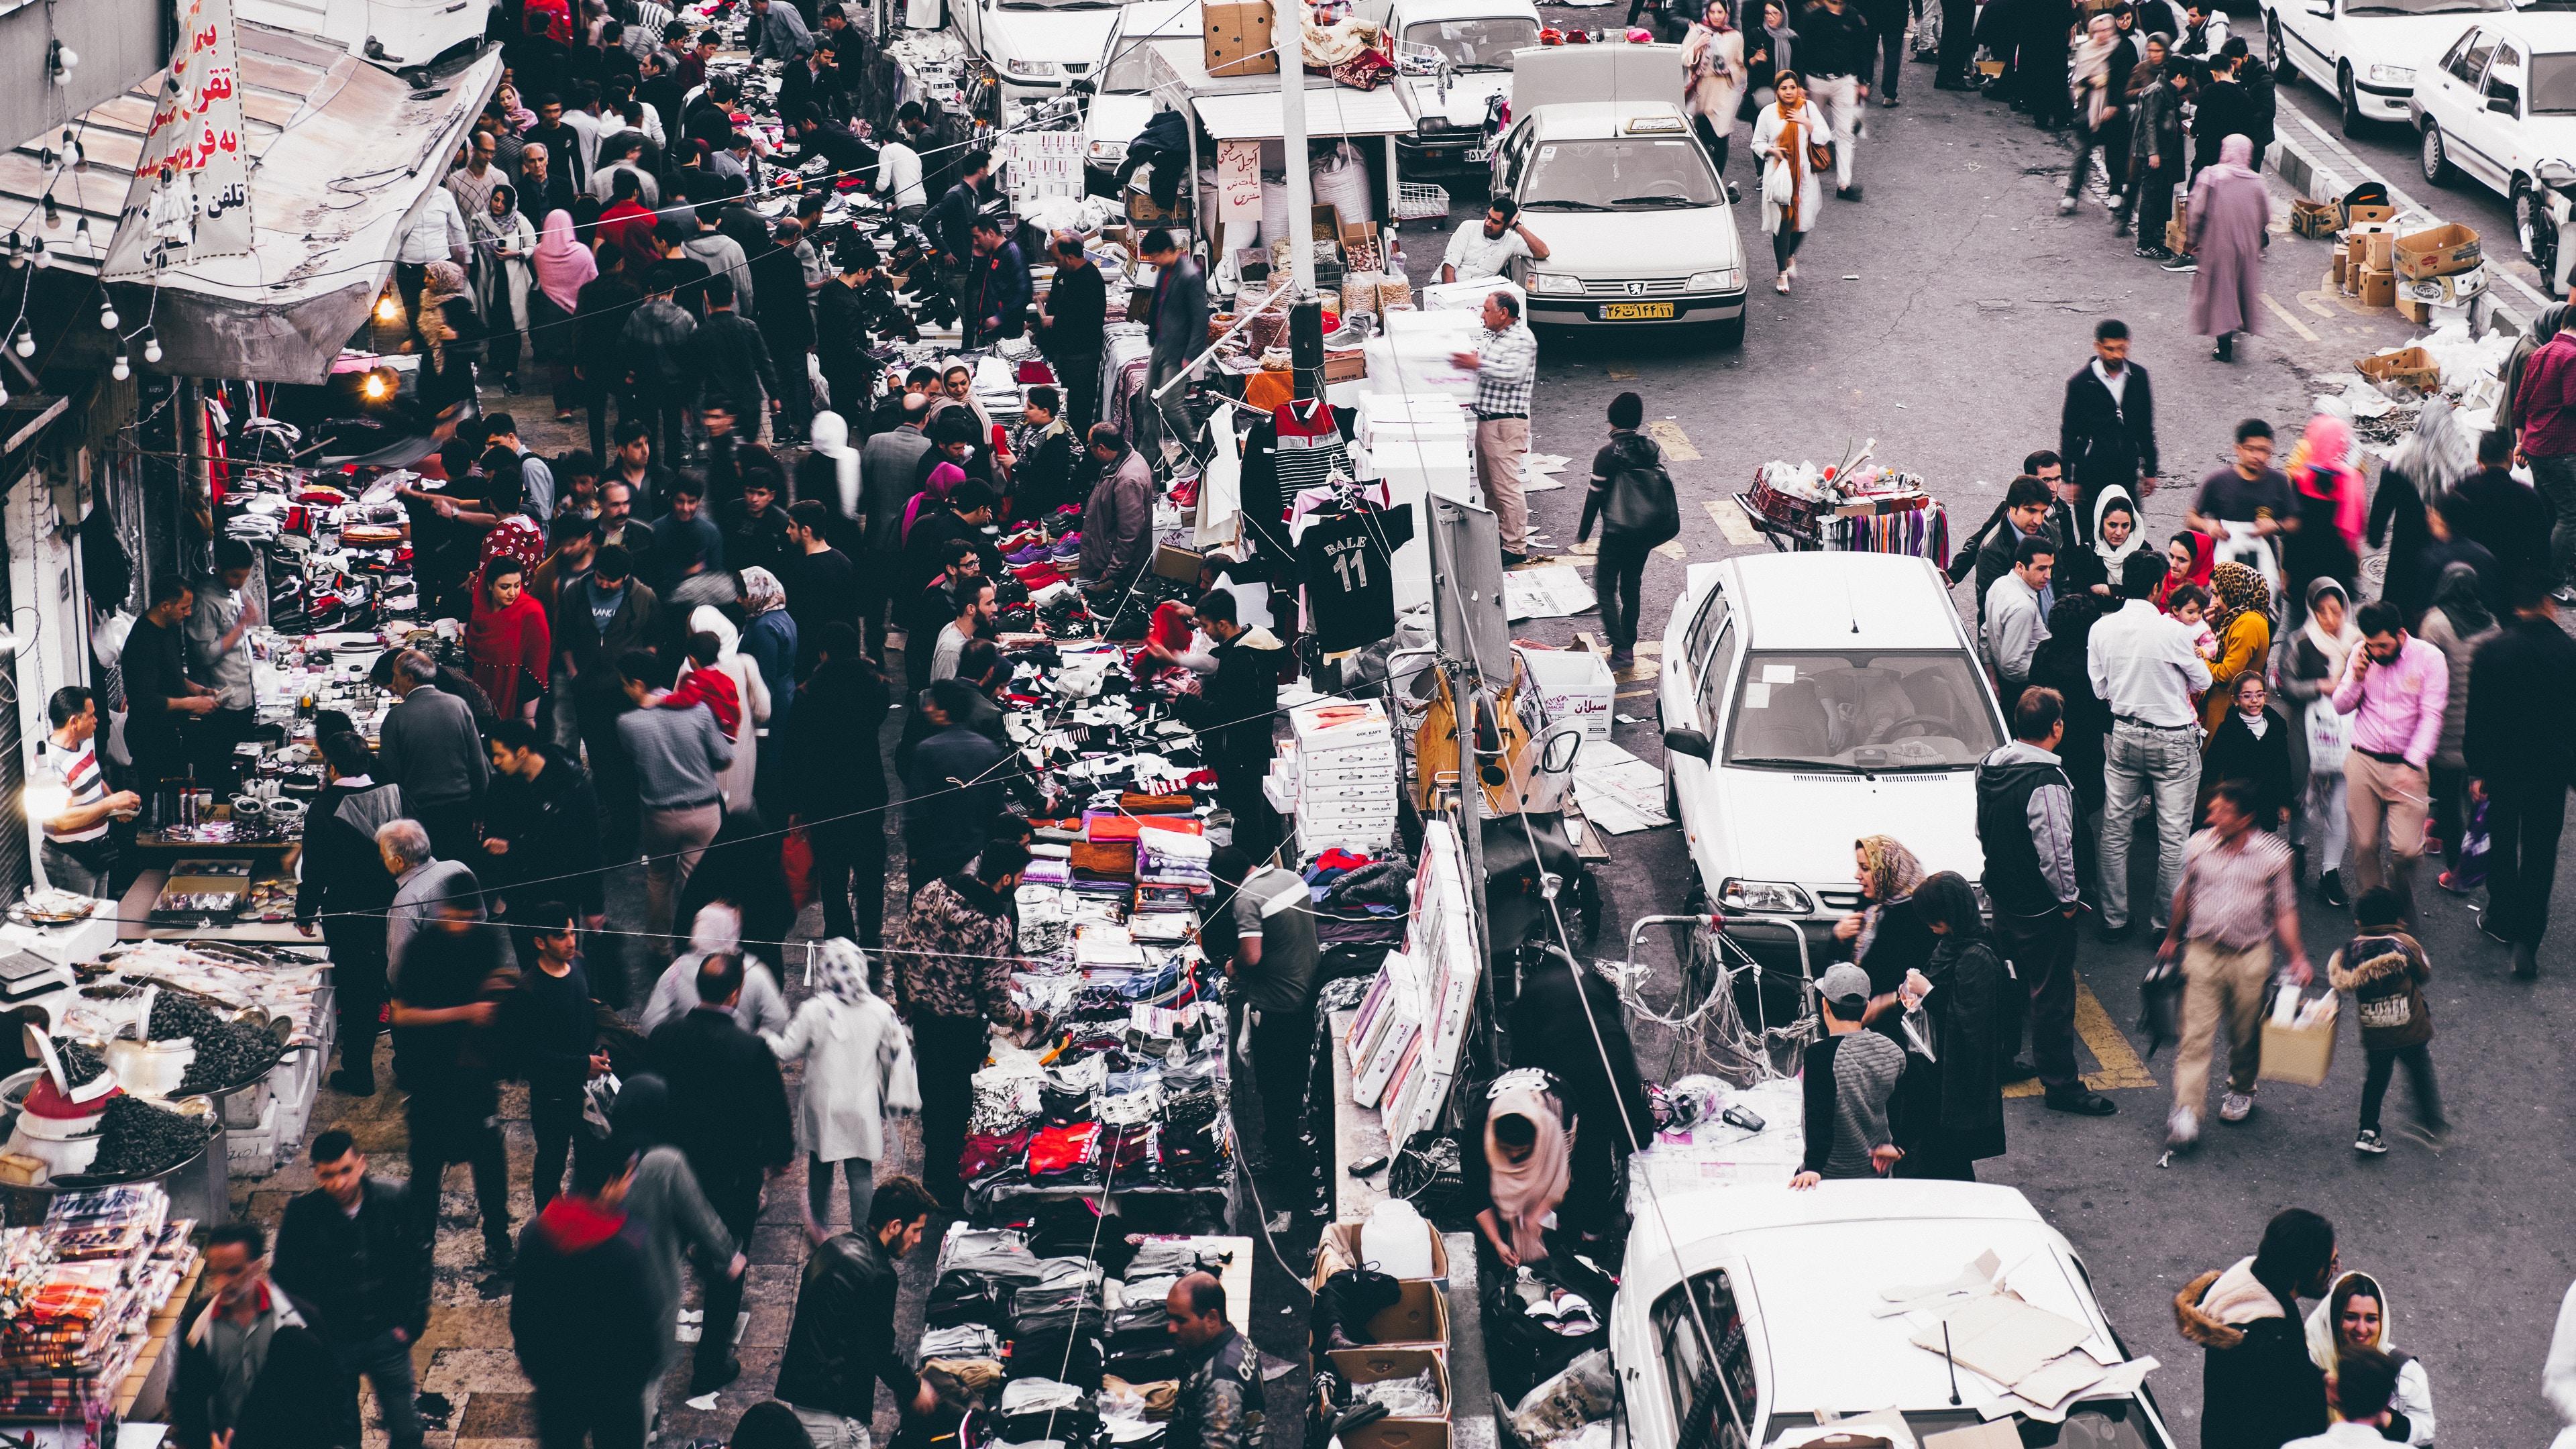 people gathering on road during daytime